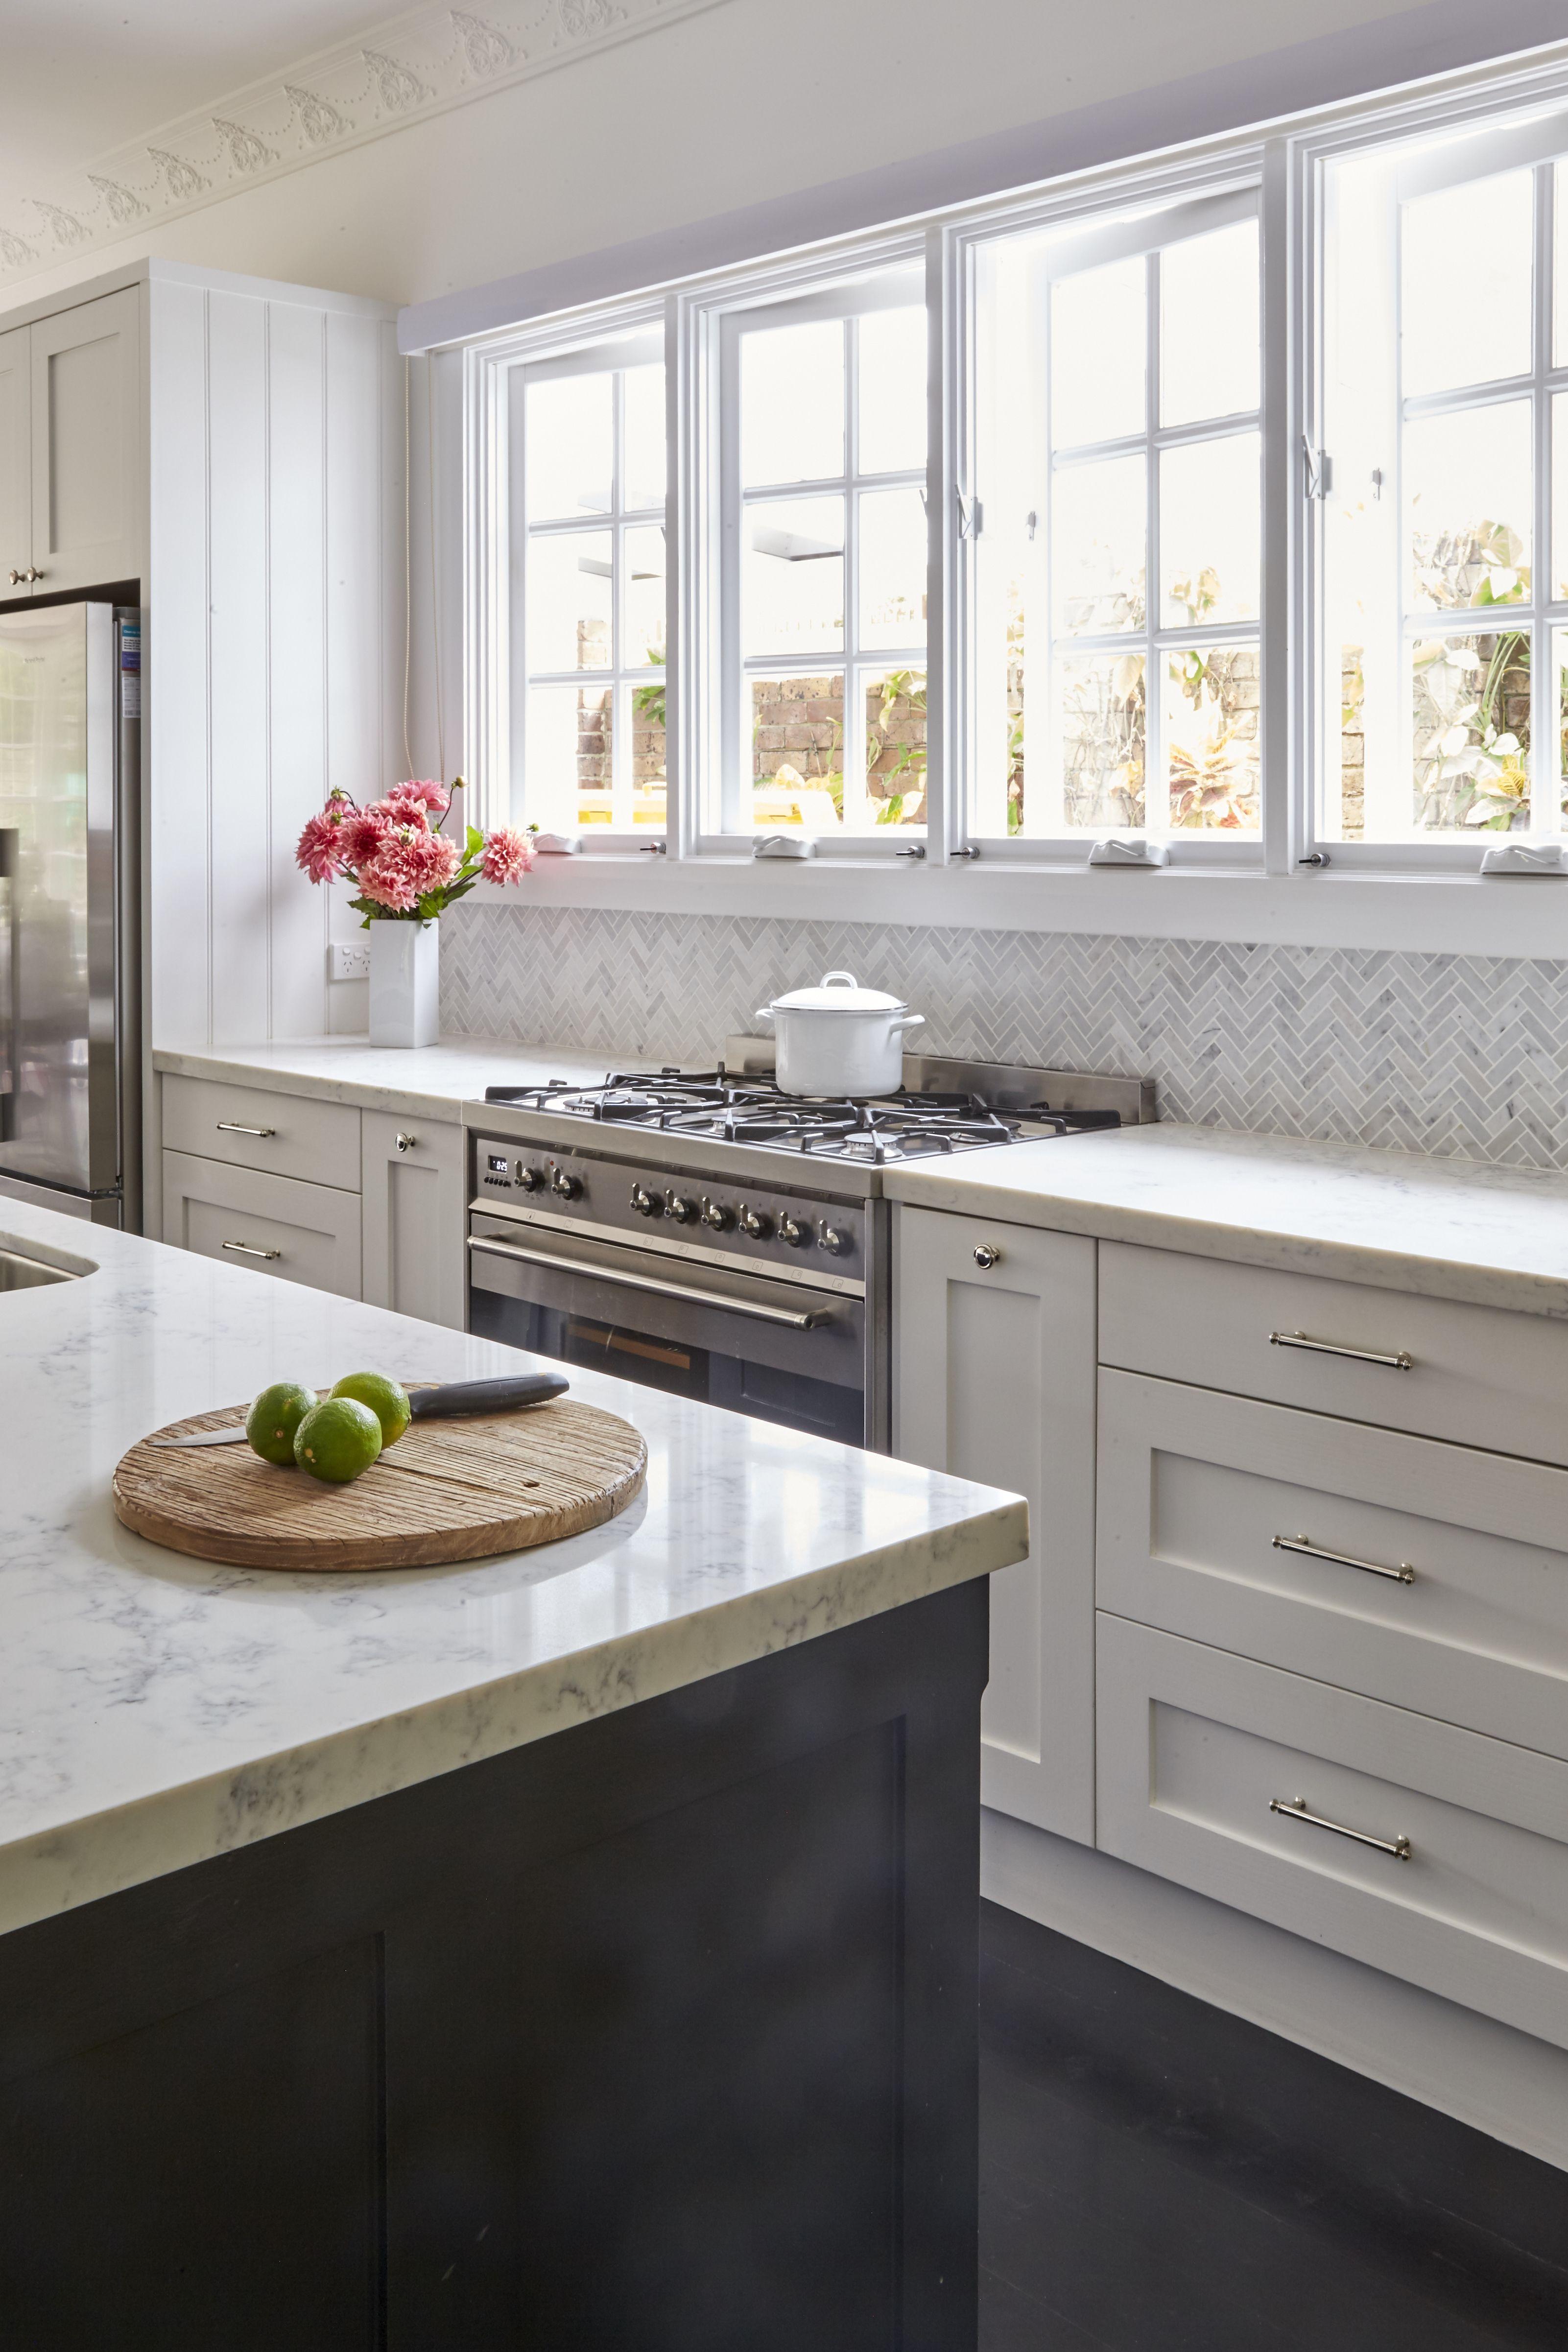 Provincial Kitchen, Shaker, White, Grey, Hamptons Style